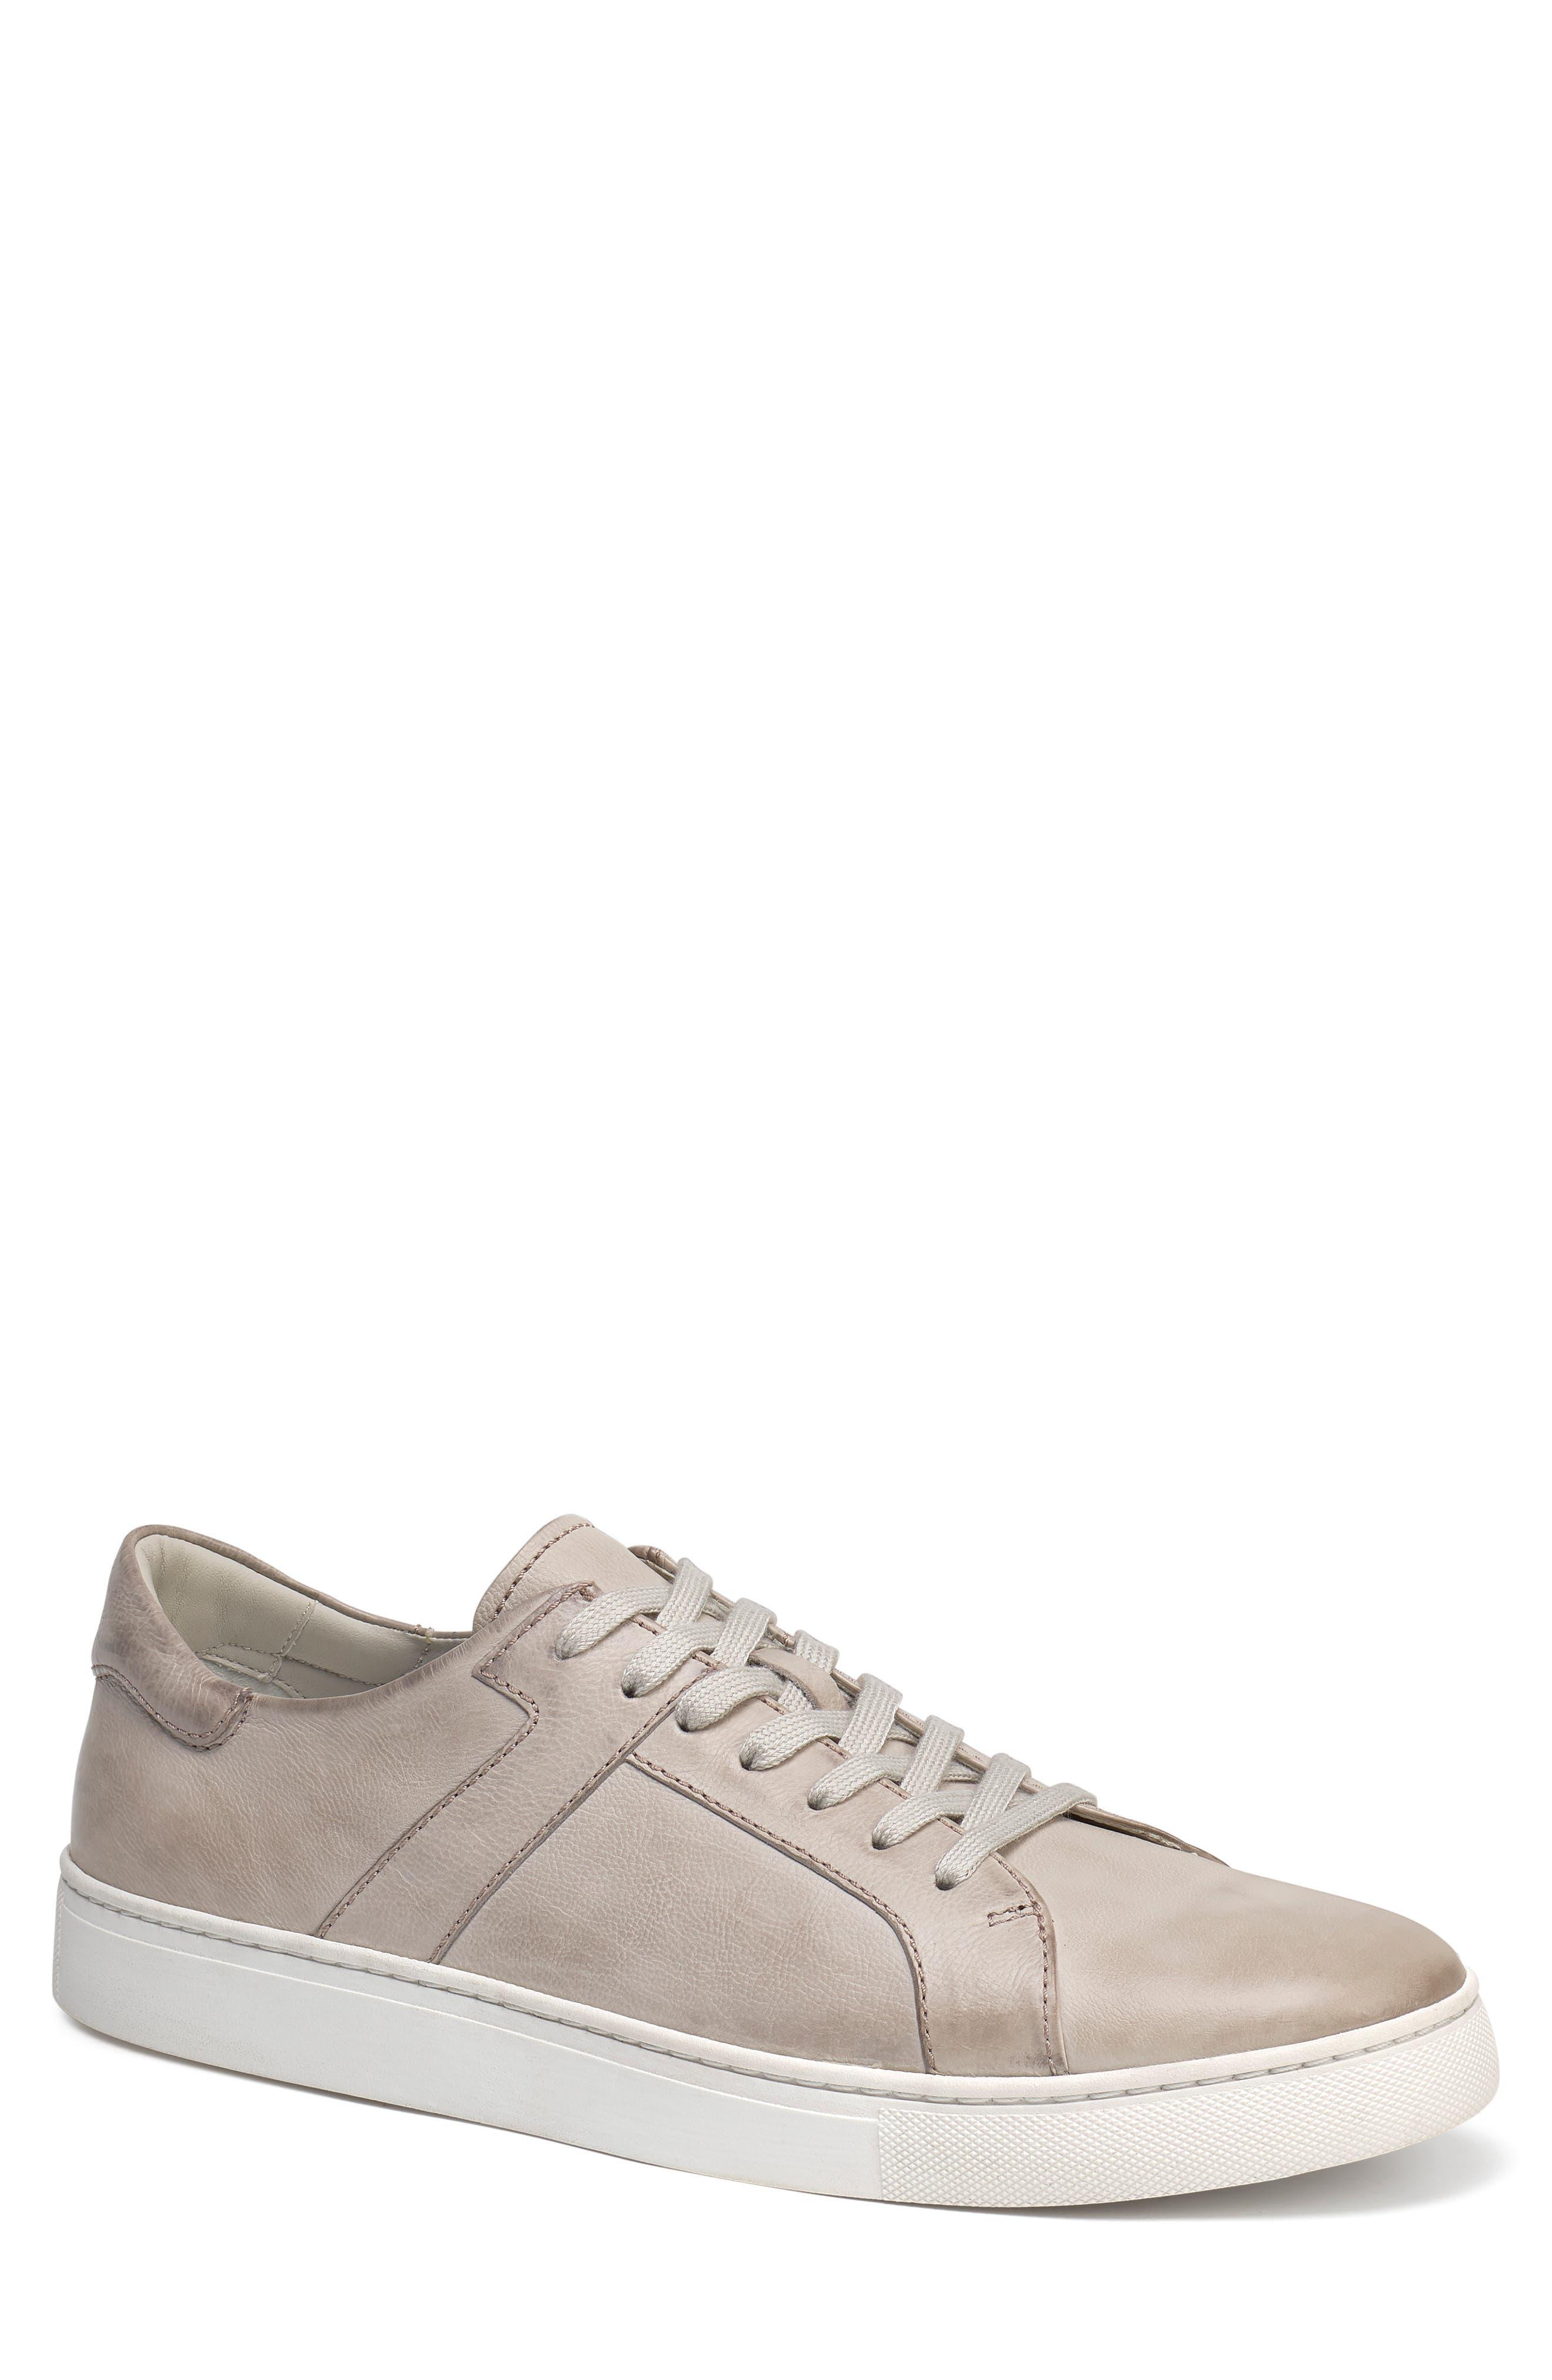 Trask Aaron Sneaker- Grey